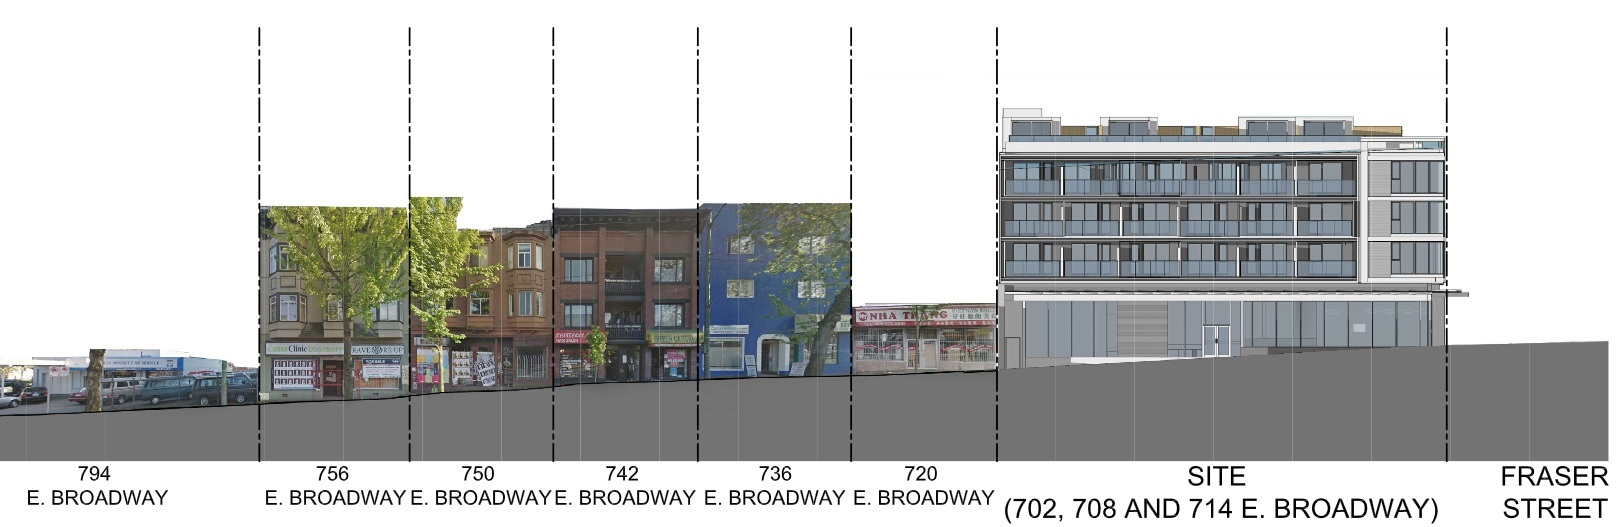 702 East Broadway_3